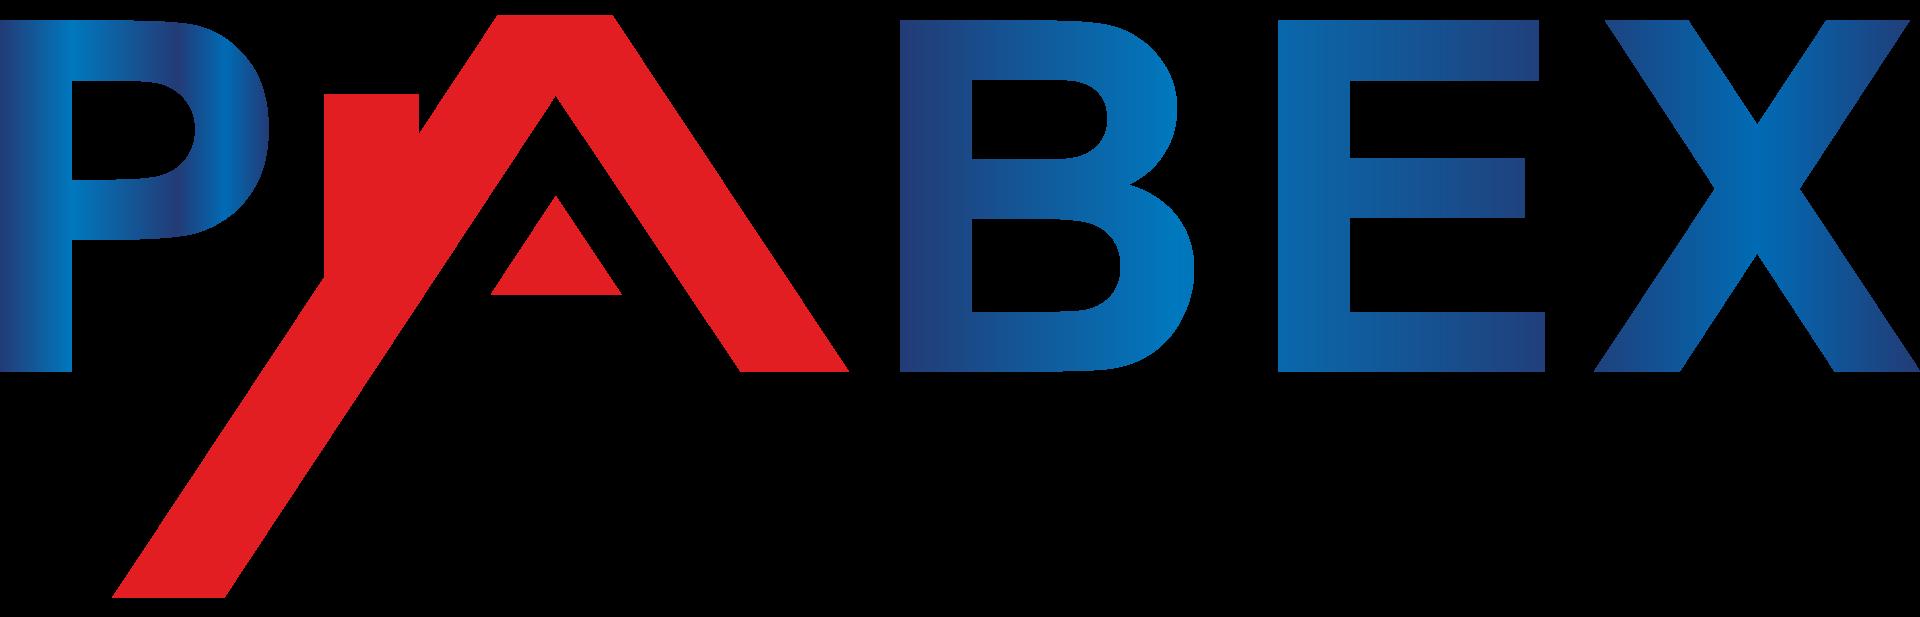 Pabex.pl